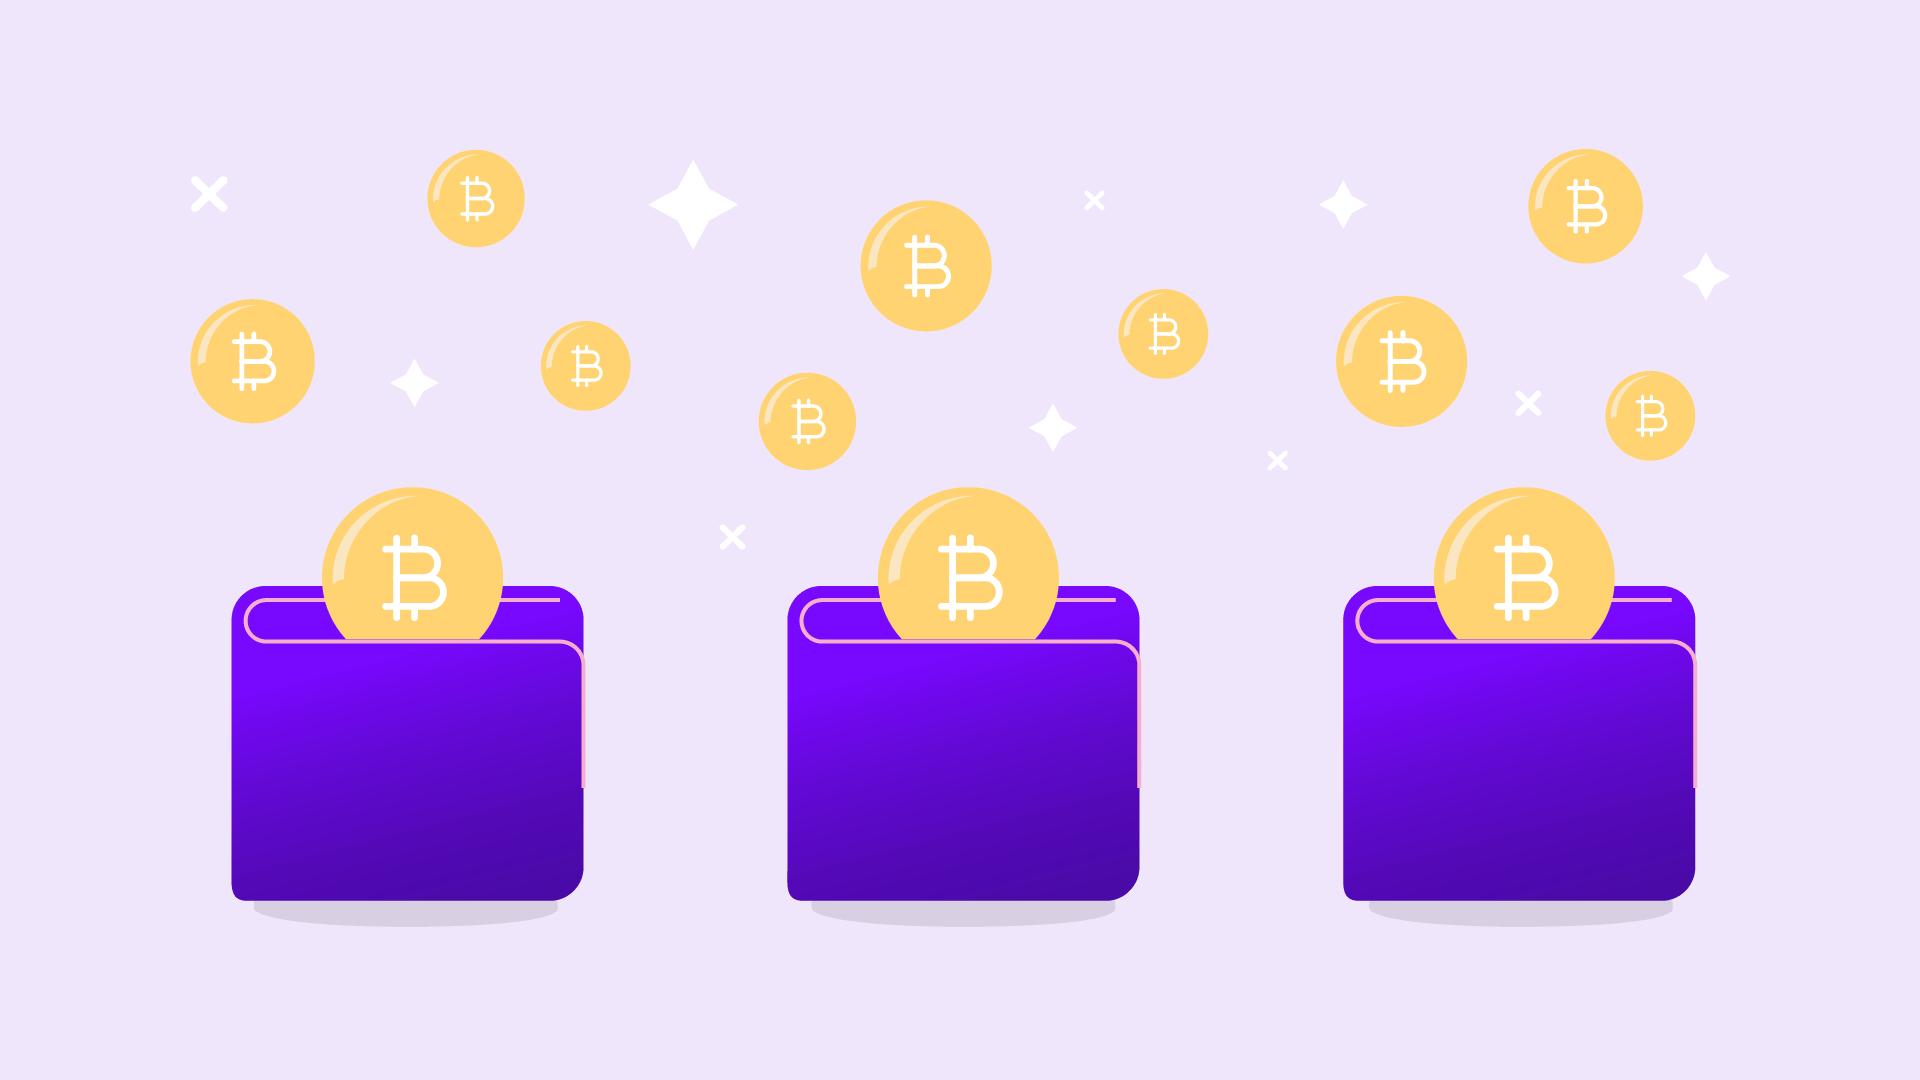 Wallets de criptomonedas